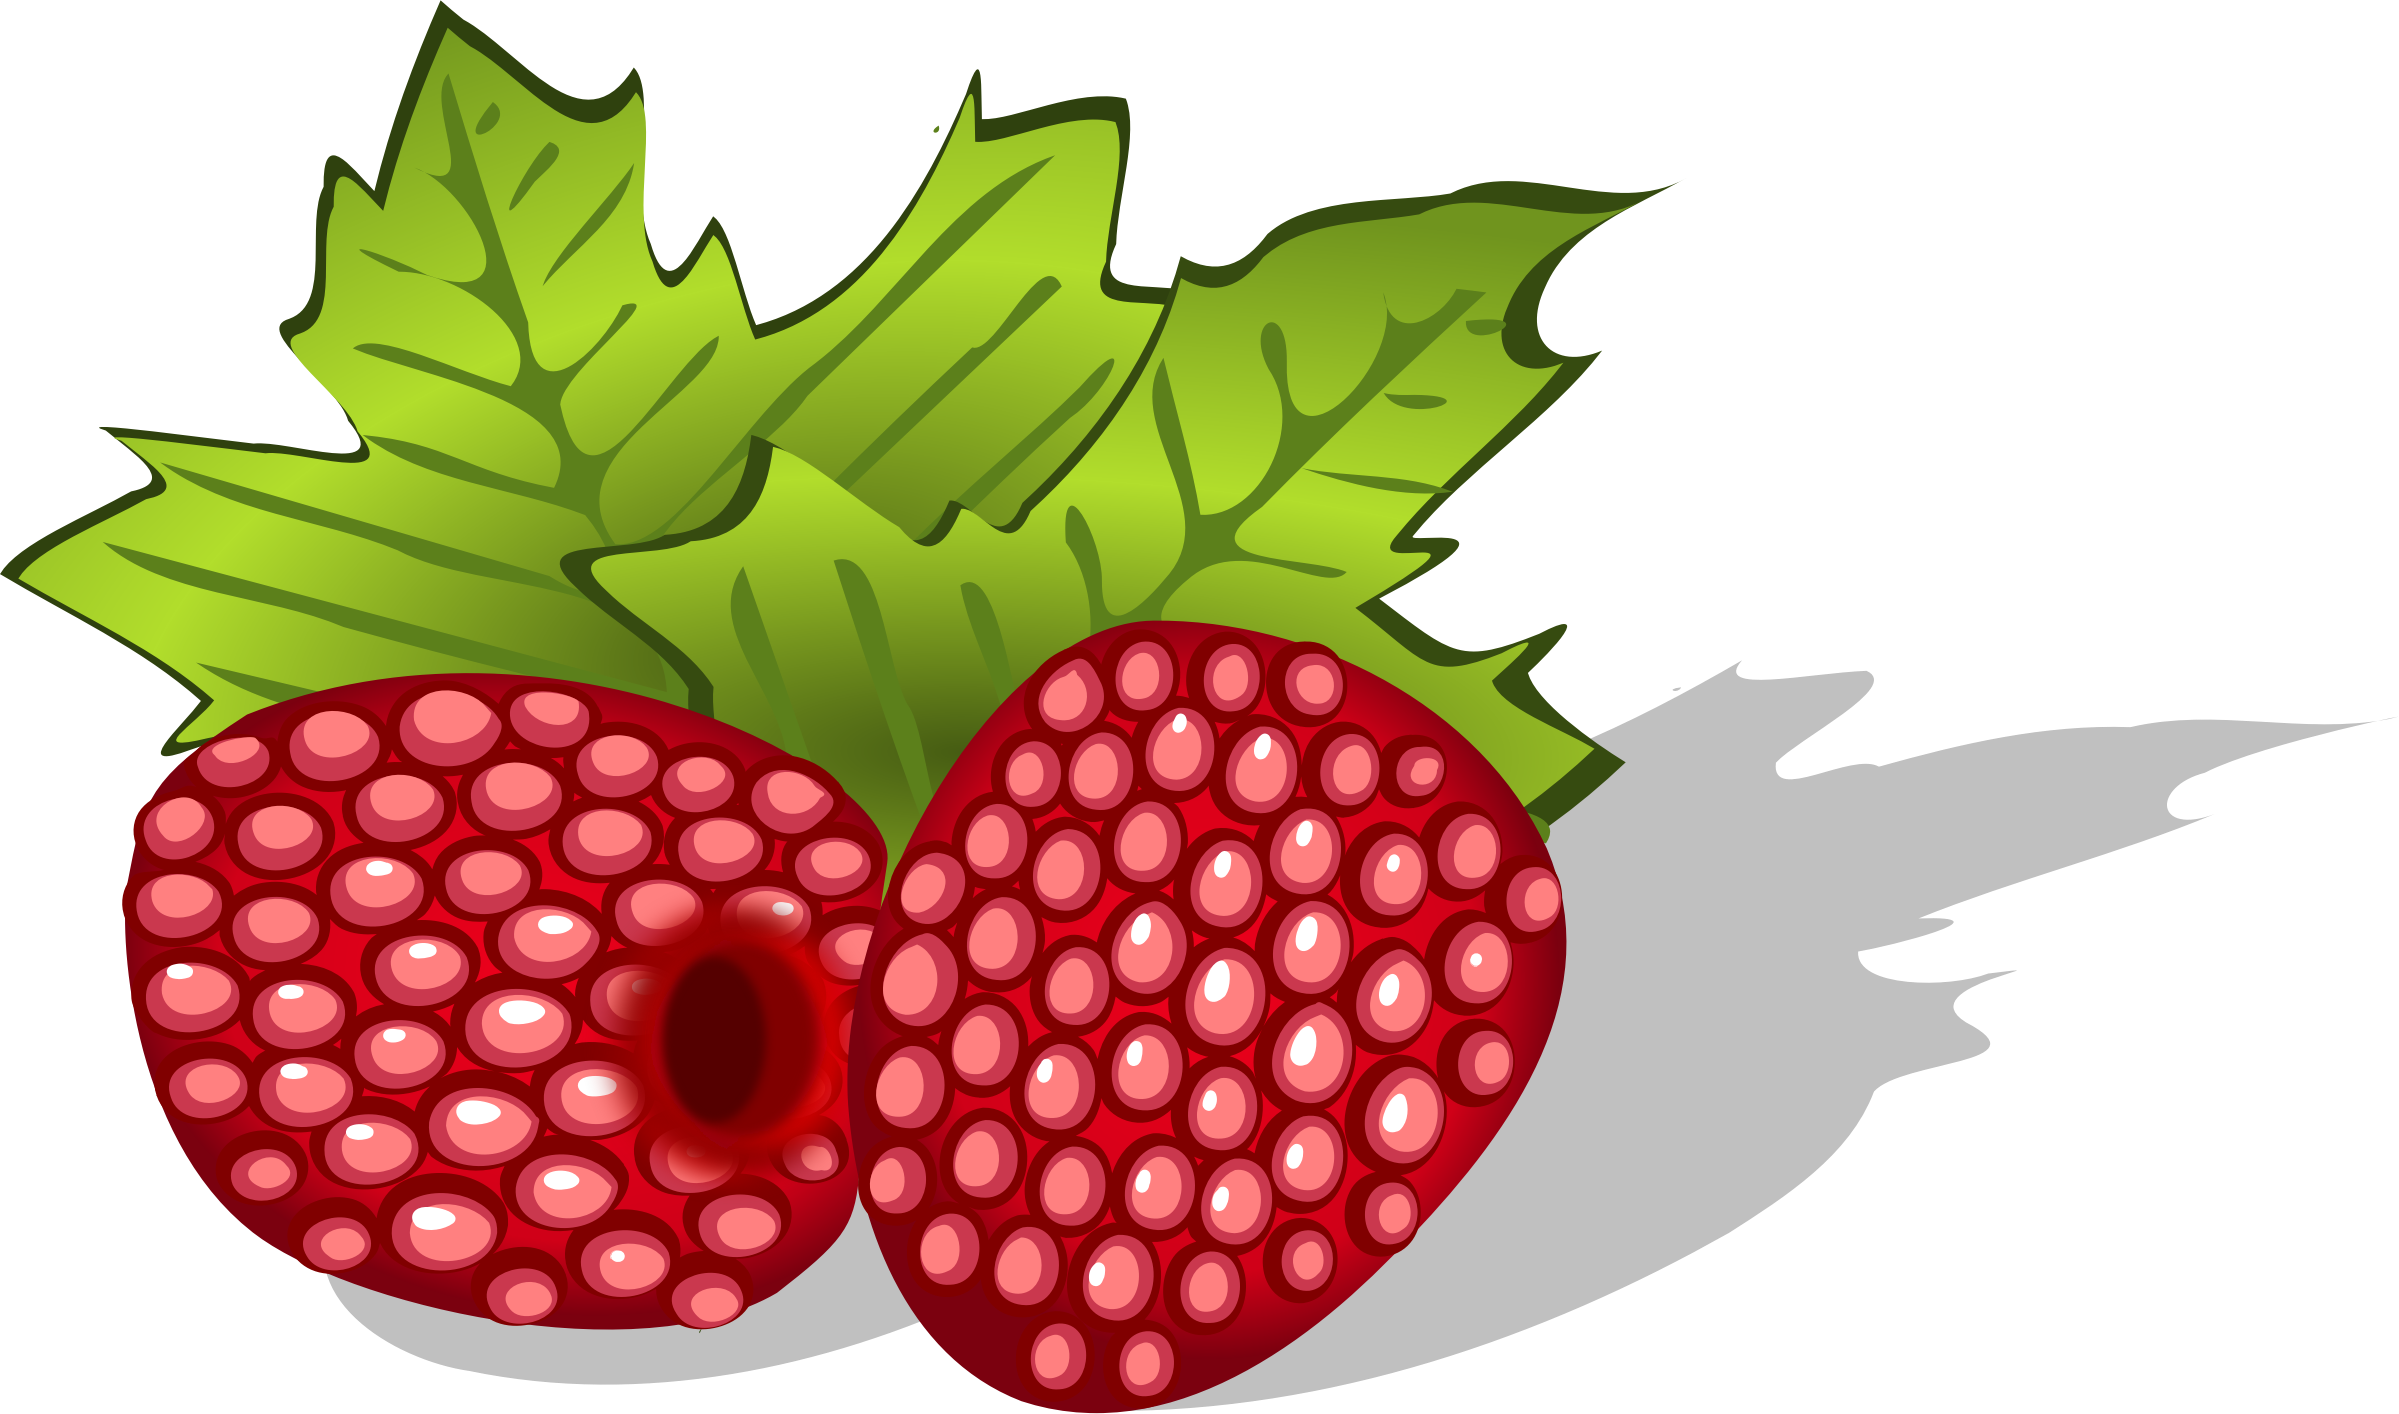 Raspberries avietes berries uogos. Bushes clipart raspberry